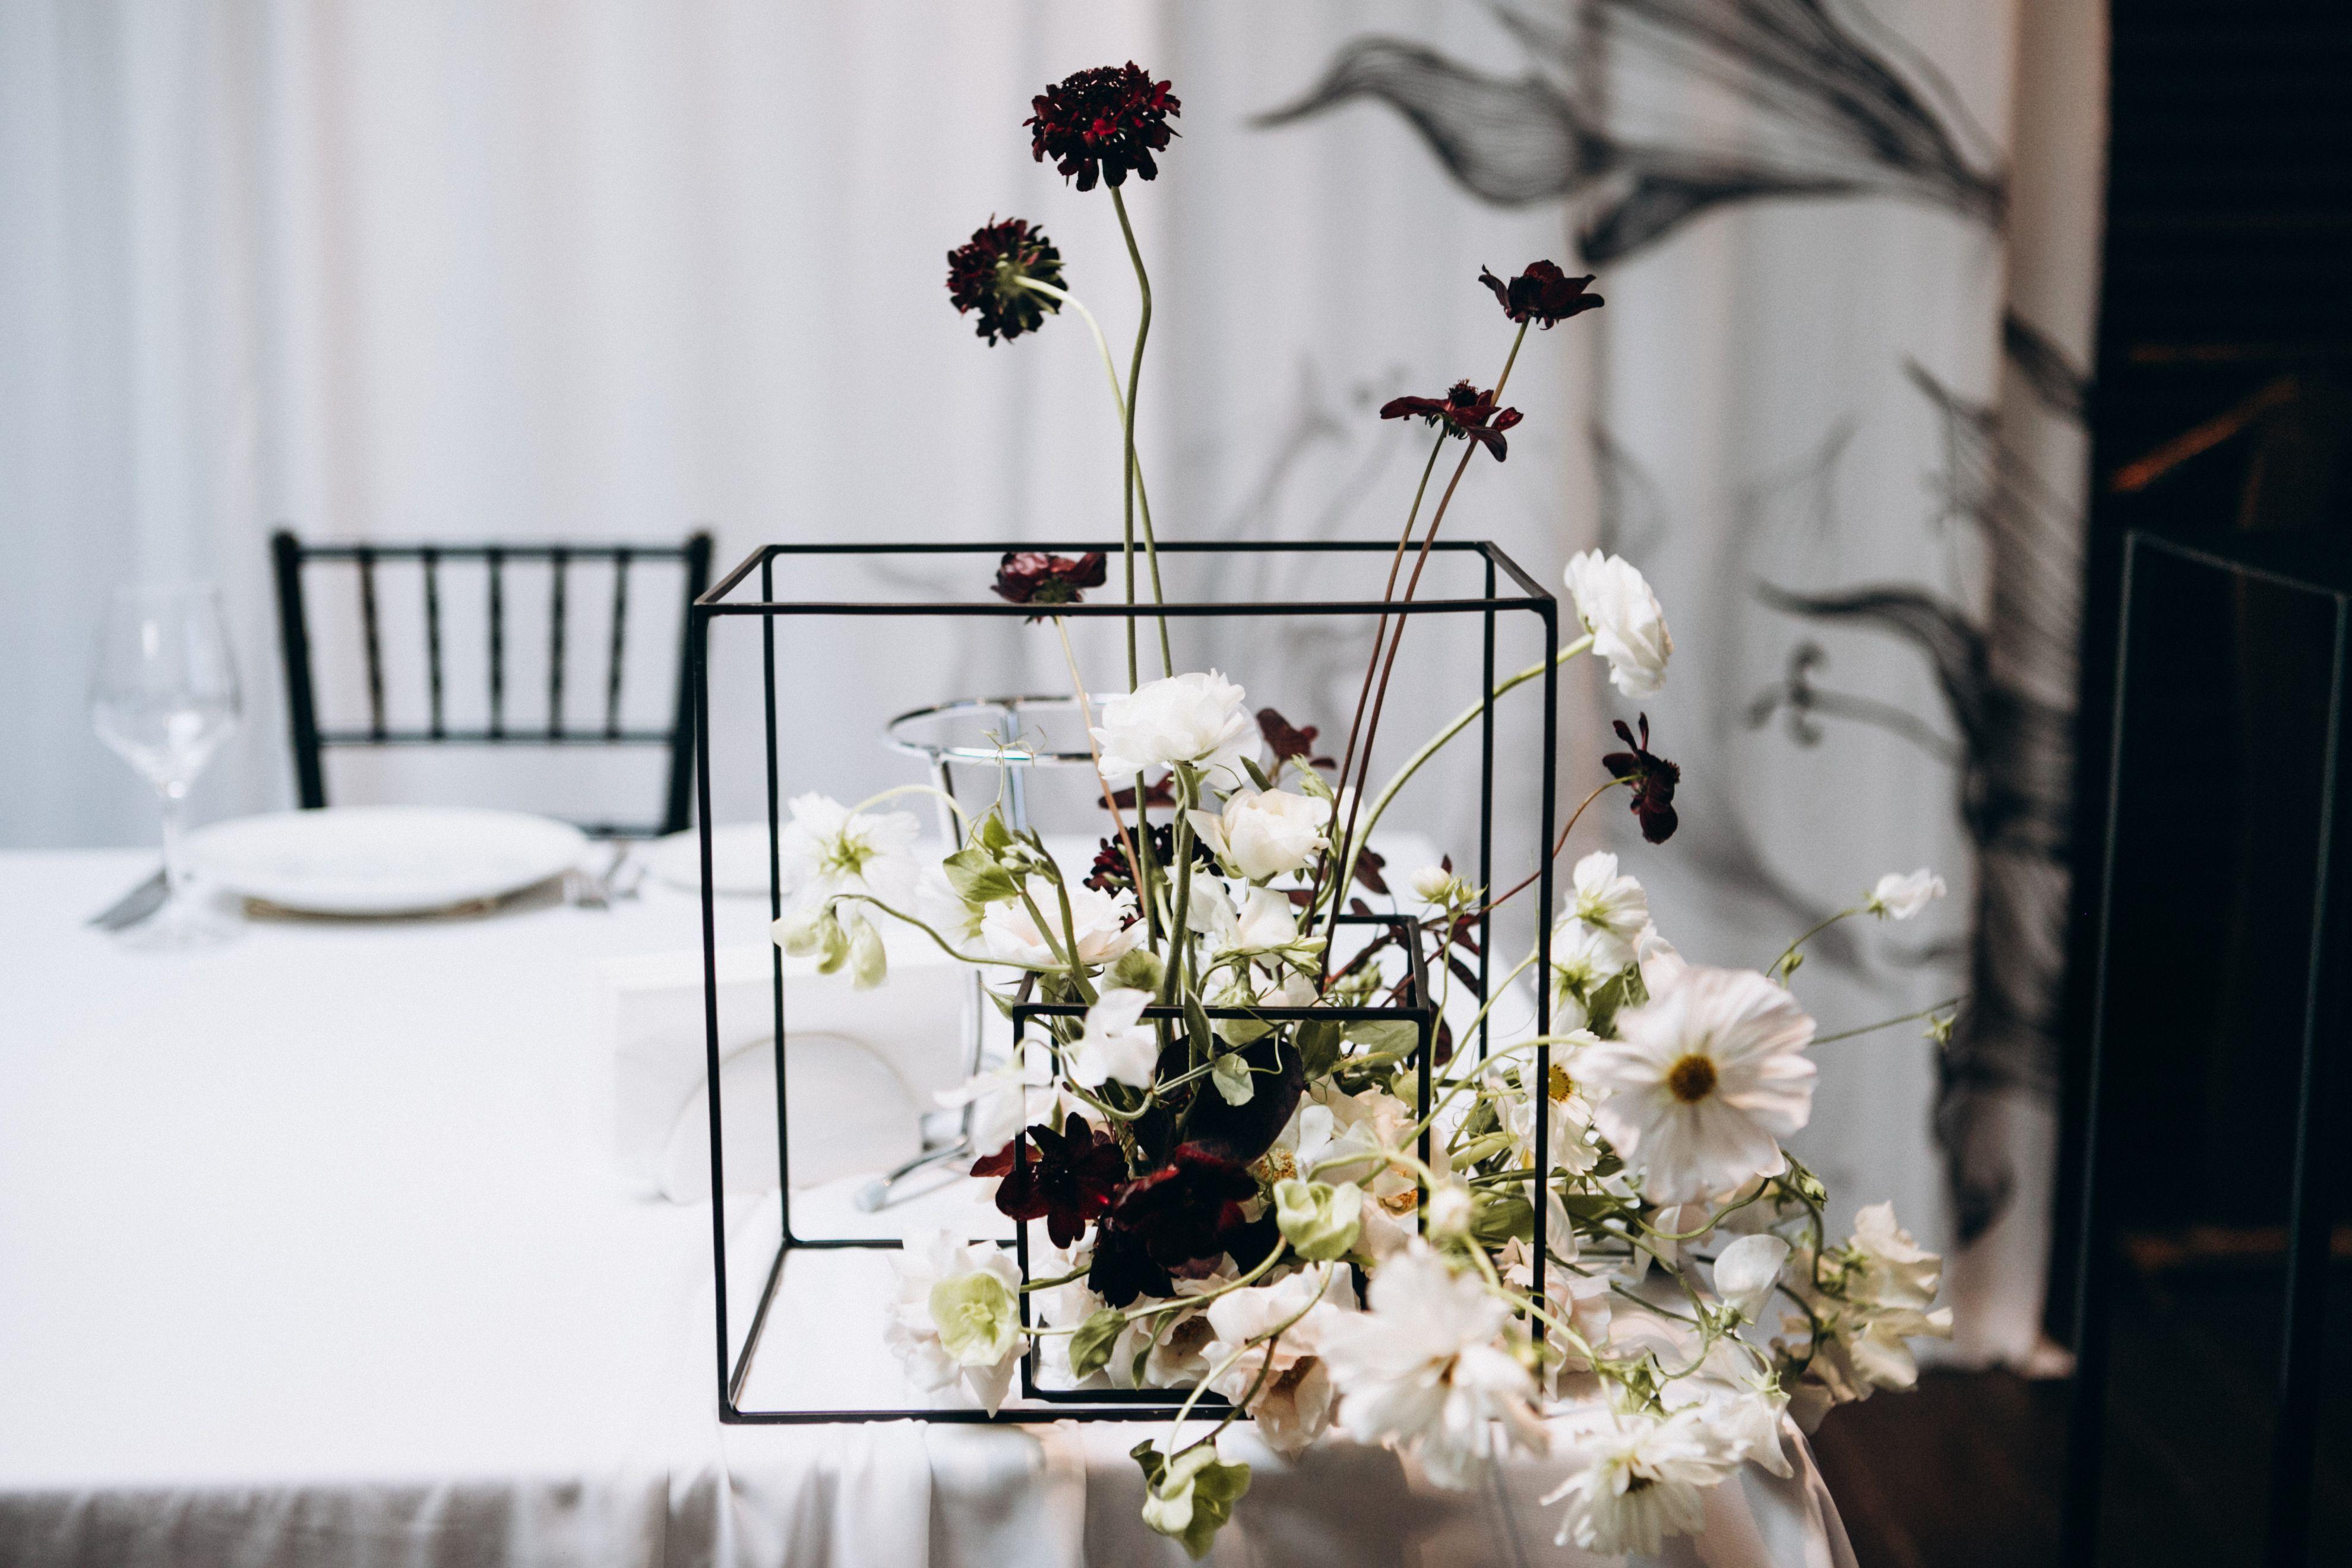 Stylish Wedding Centerpieces Geometric Decor Black And White